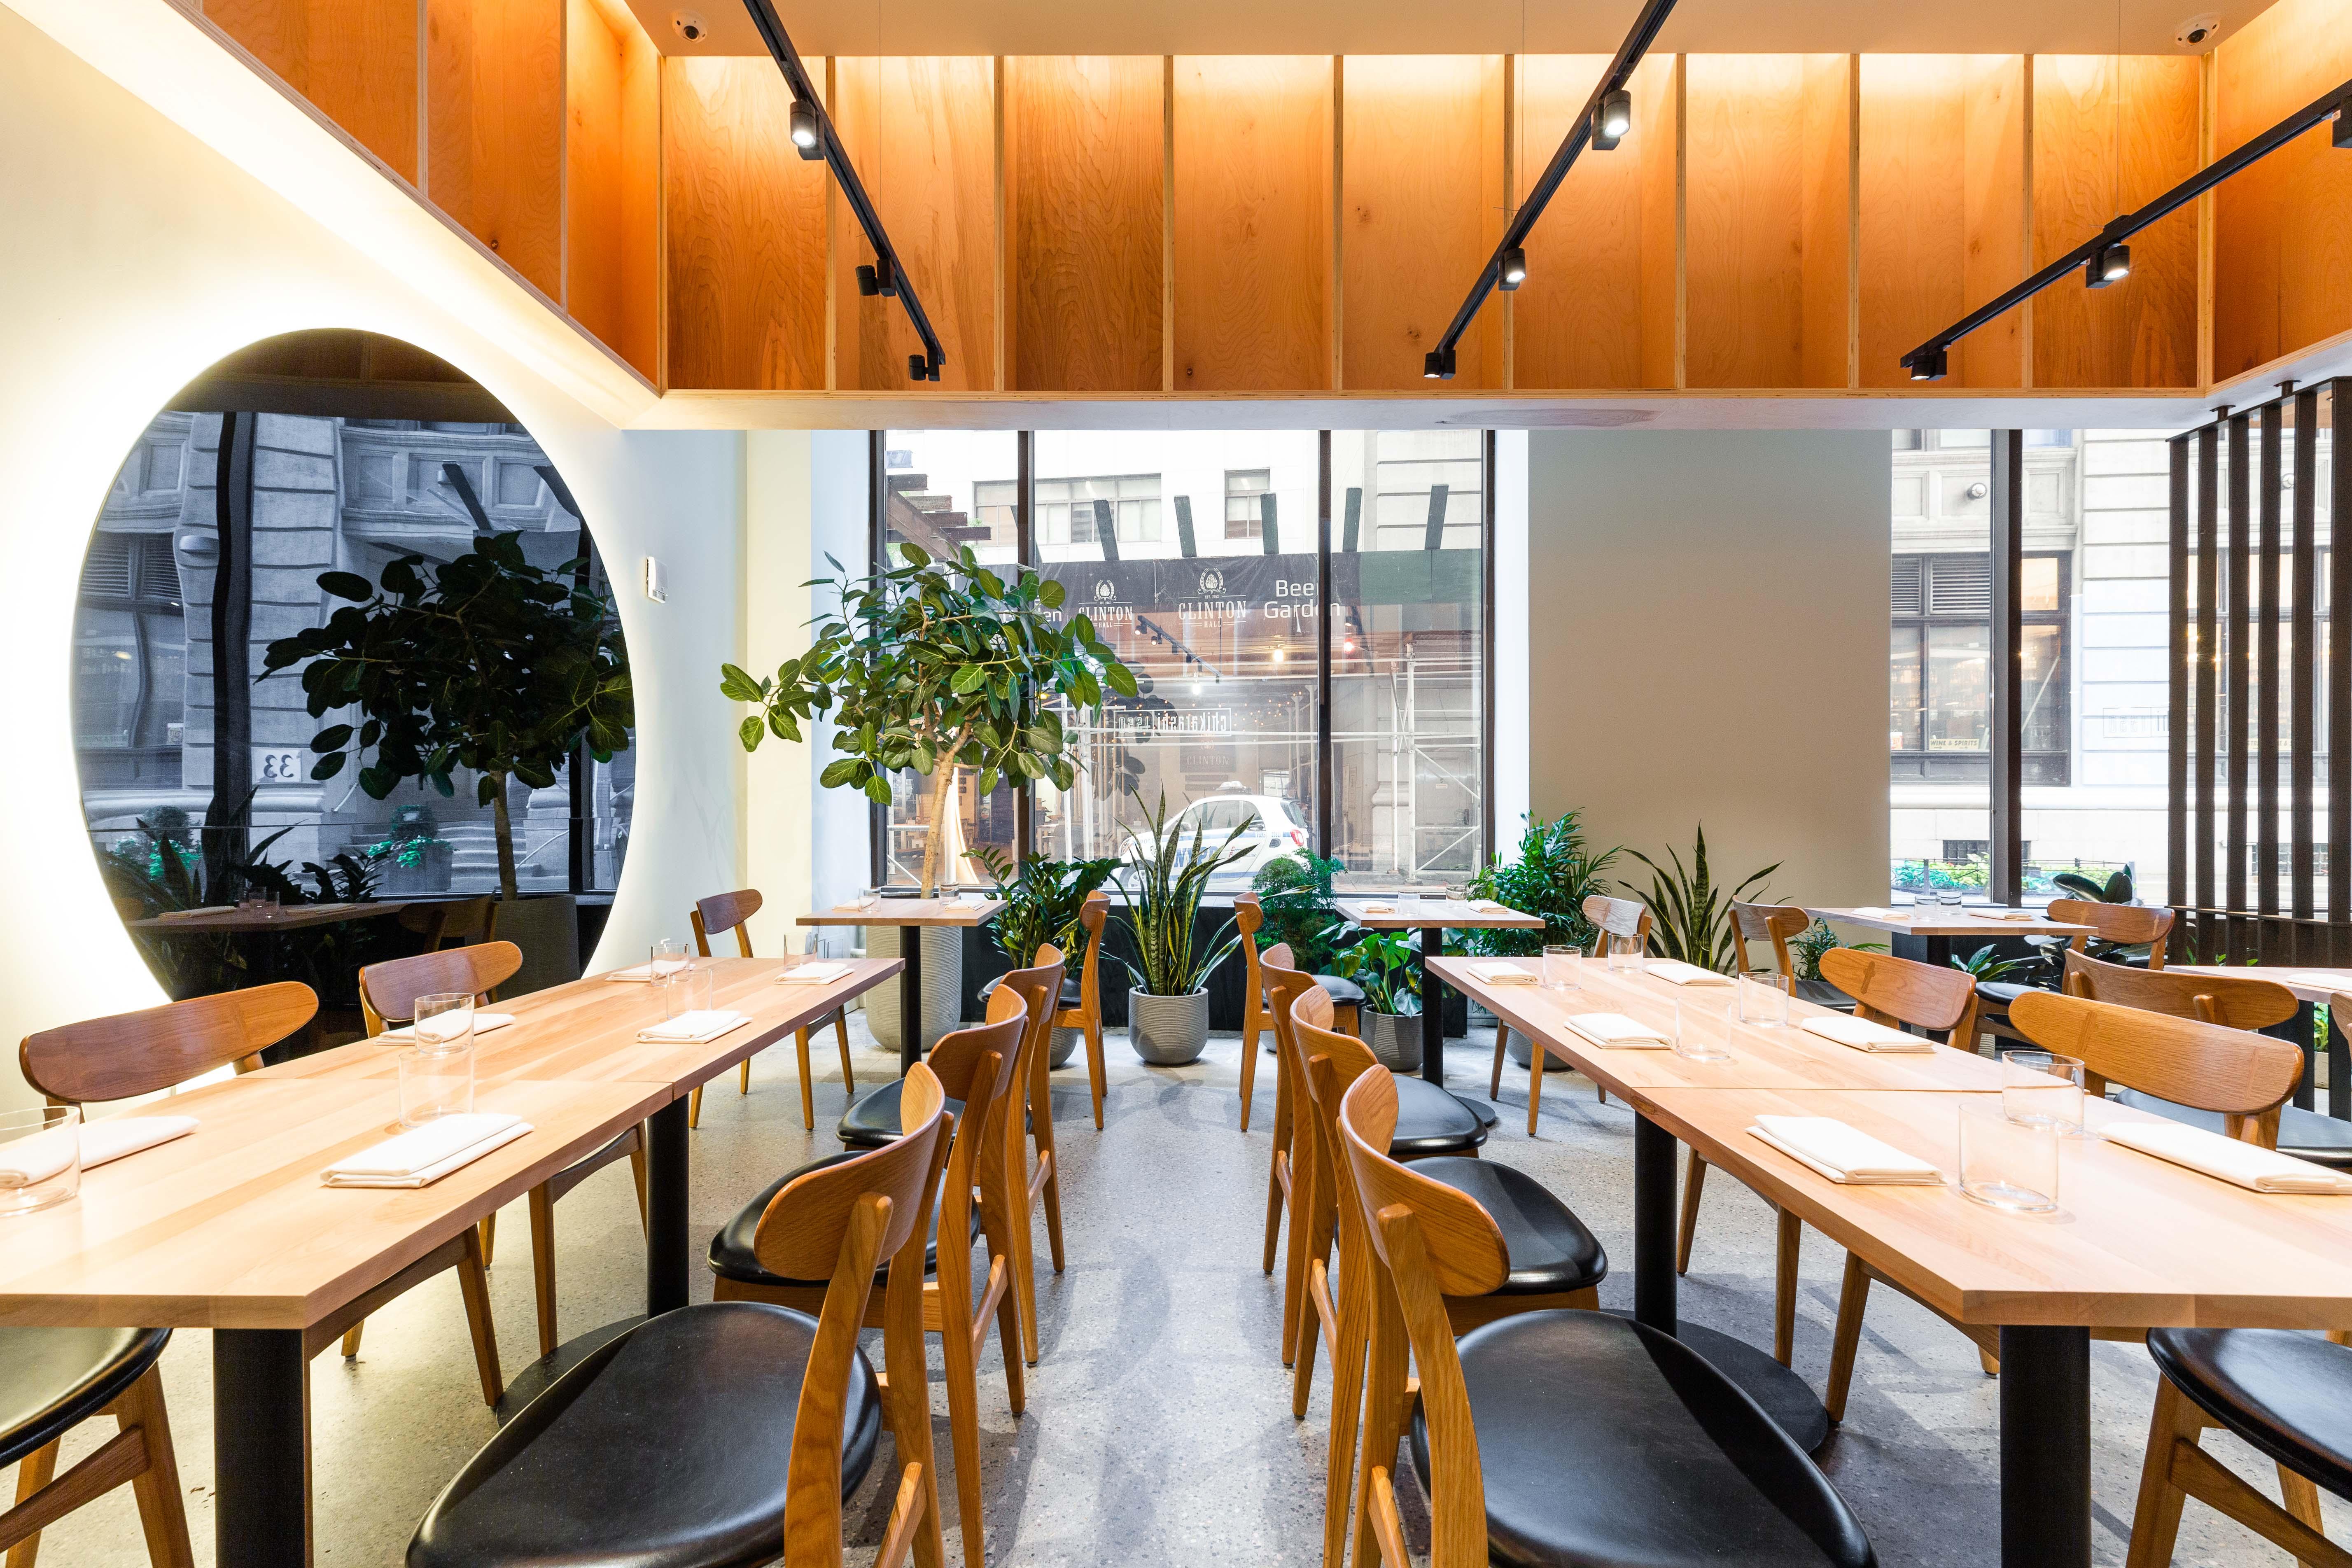 The golden-lit interior of a sleek restaurant space